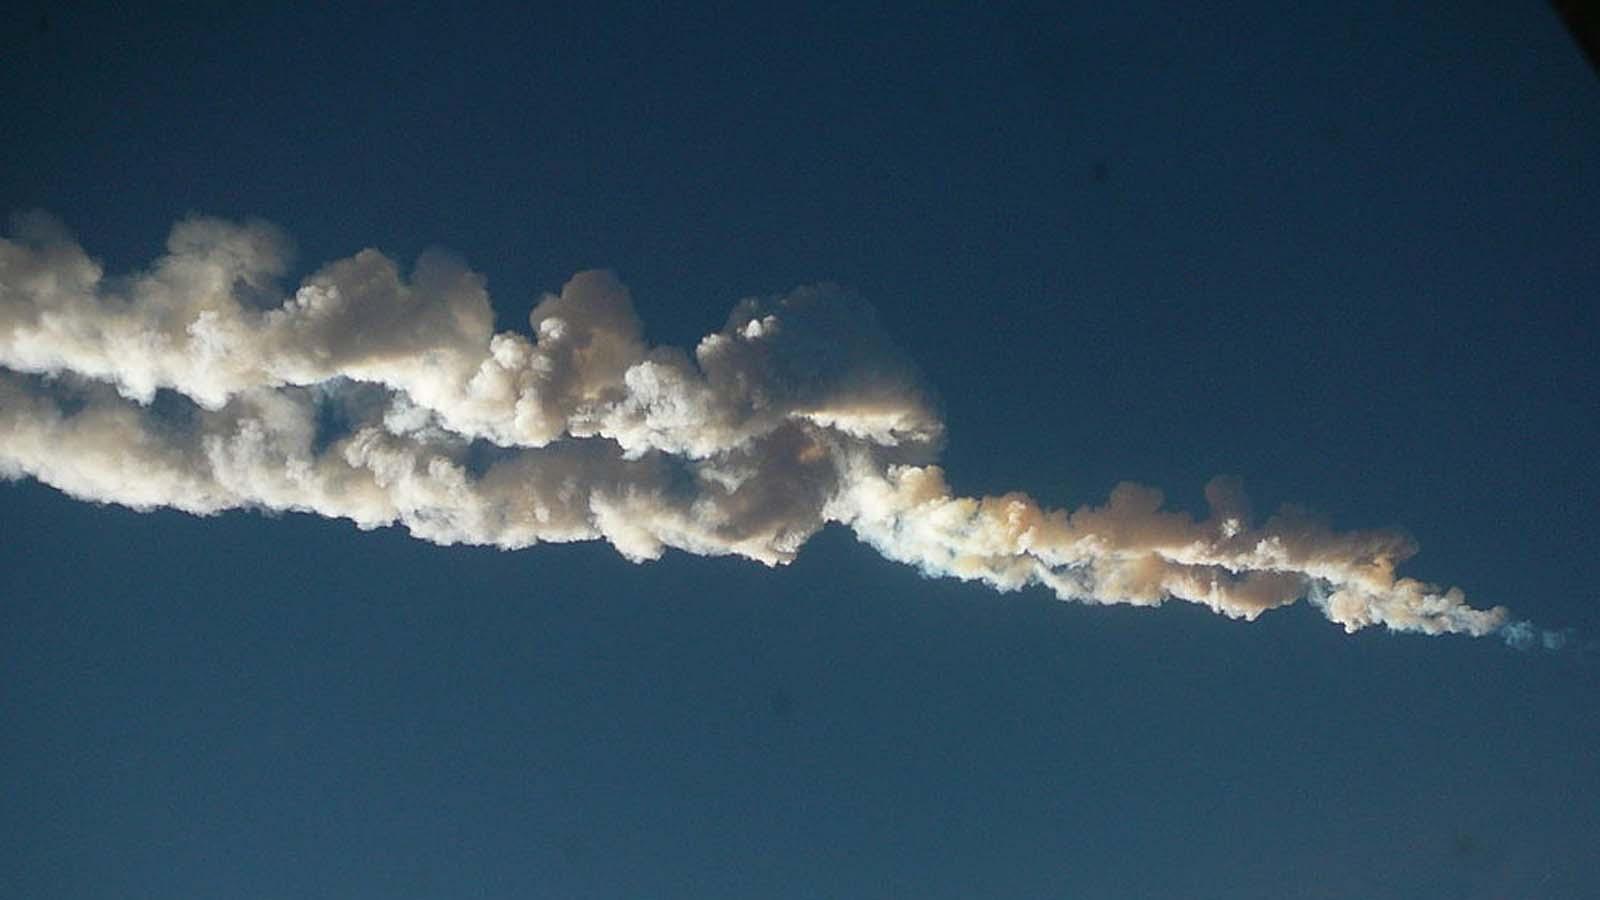 Chelyabinsk_meteor_trace_15-02-2013-pano.jpg